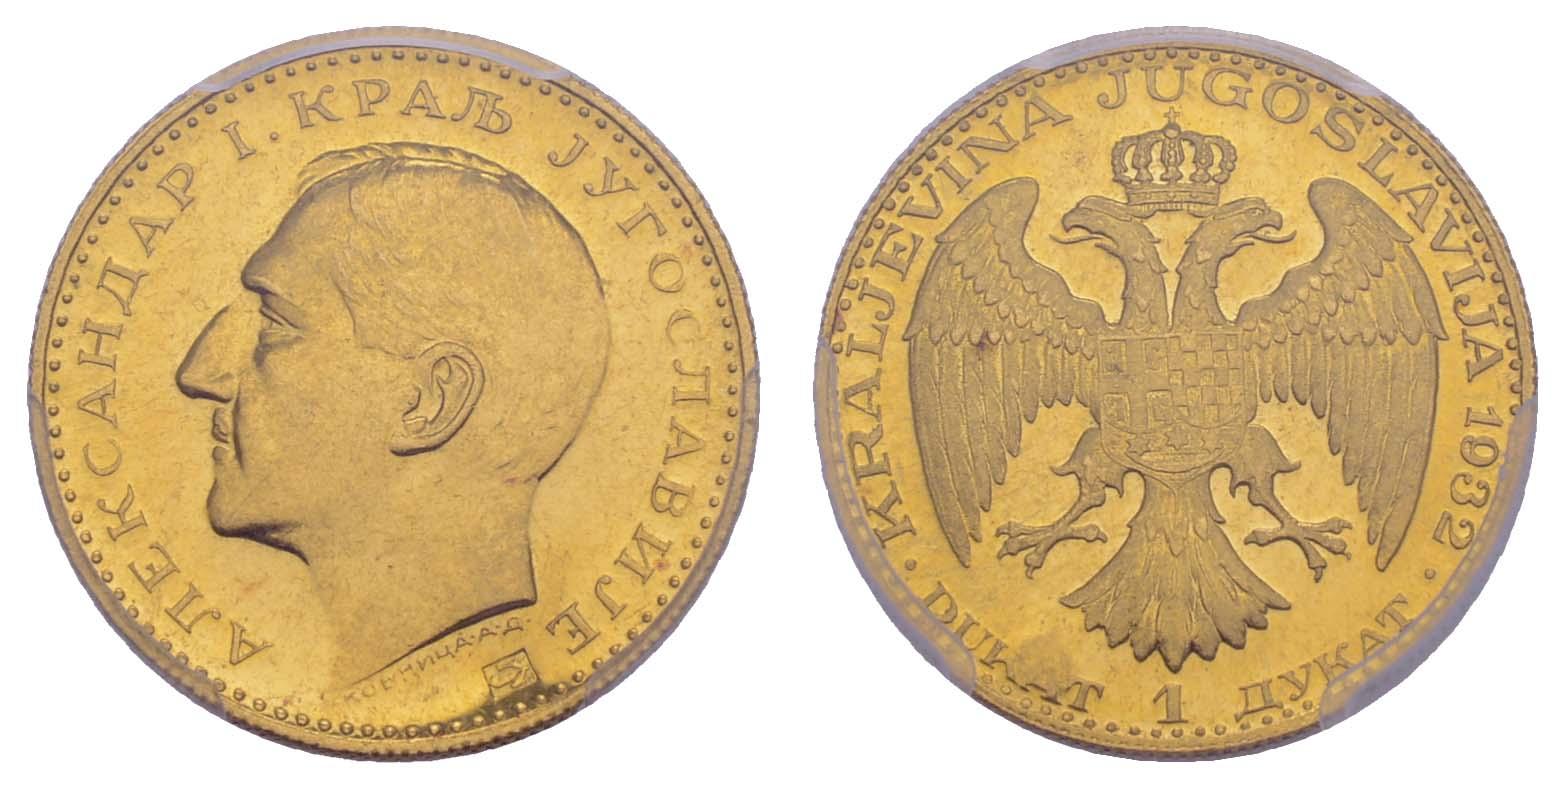 Lot 1669 - europa ab 1800 - Jugoslawien -  Auktionshaus Ulrich Felzmann GmbH & Co. KG Coins single lots